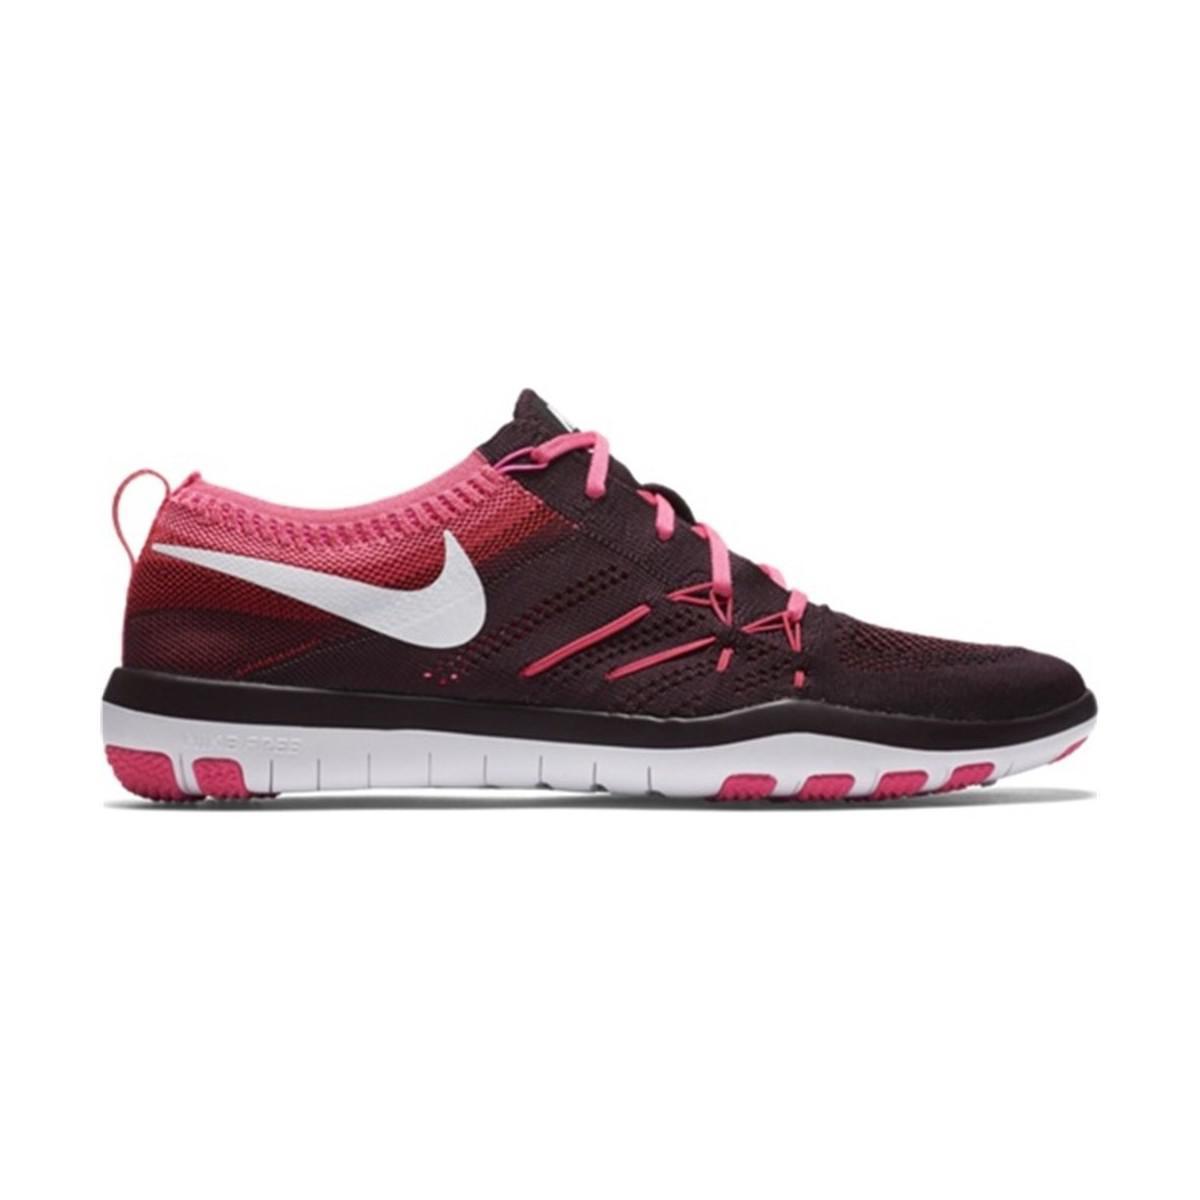 d97458490844 Nike Free Focus Flyknit Women s Shoes (trainers) In Black in Black ...